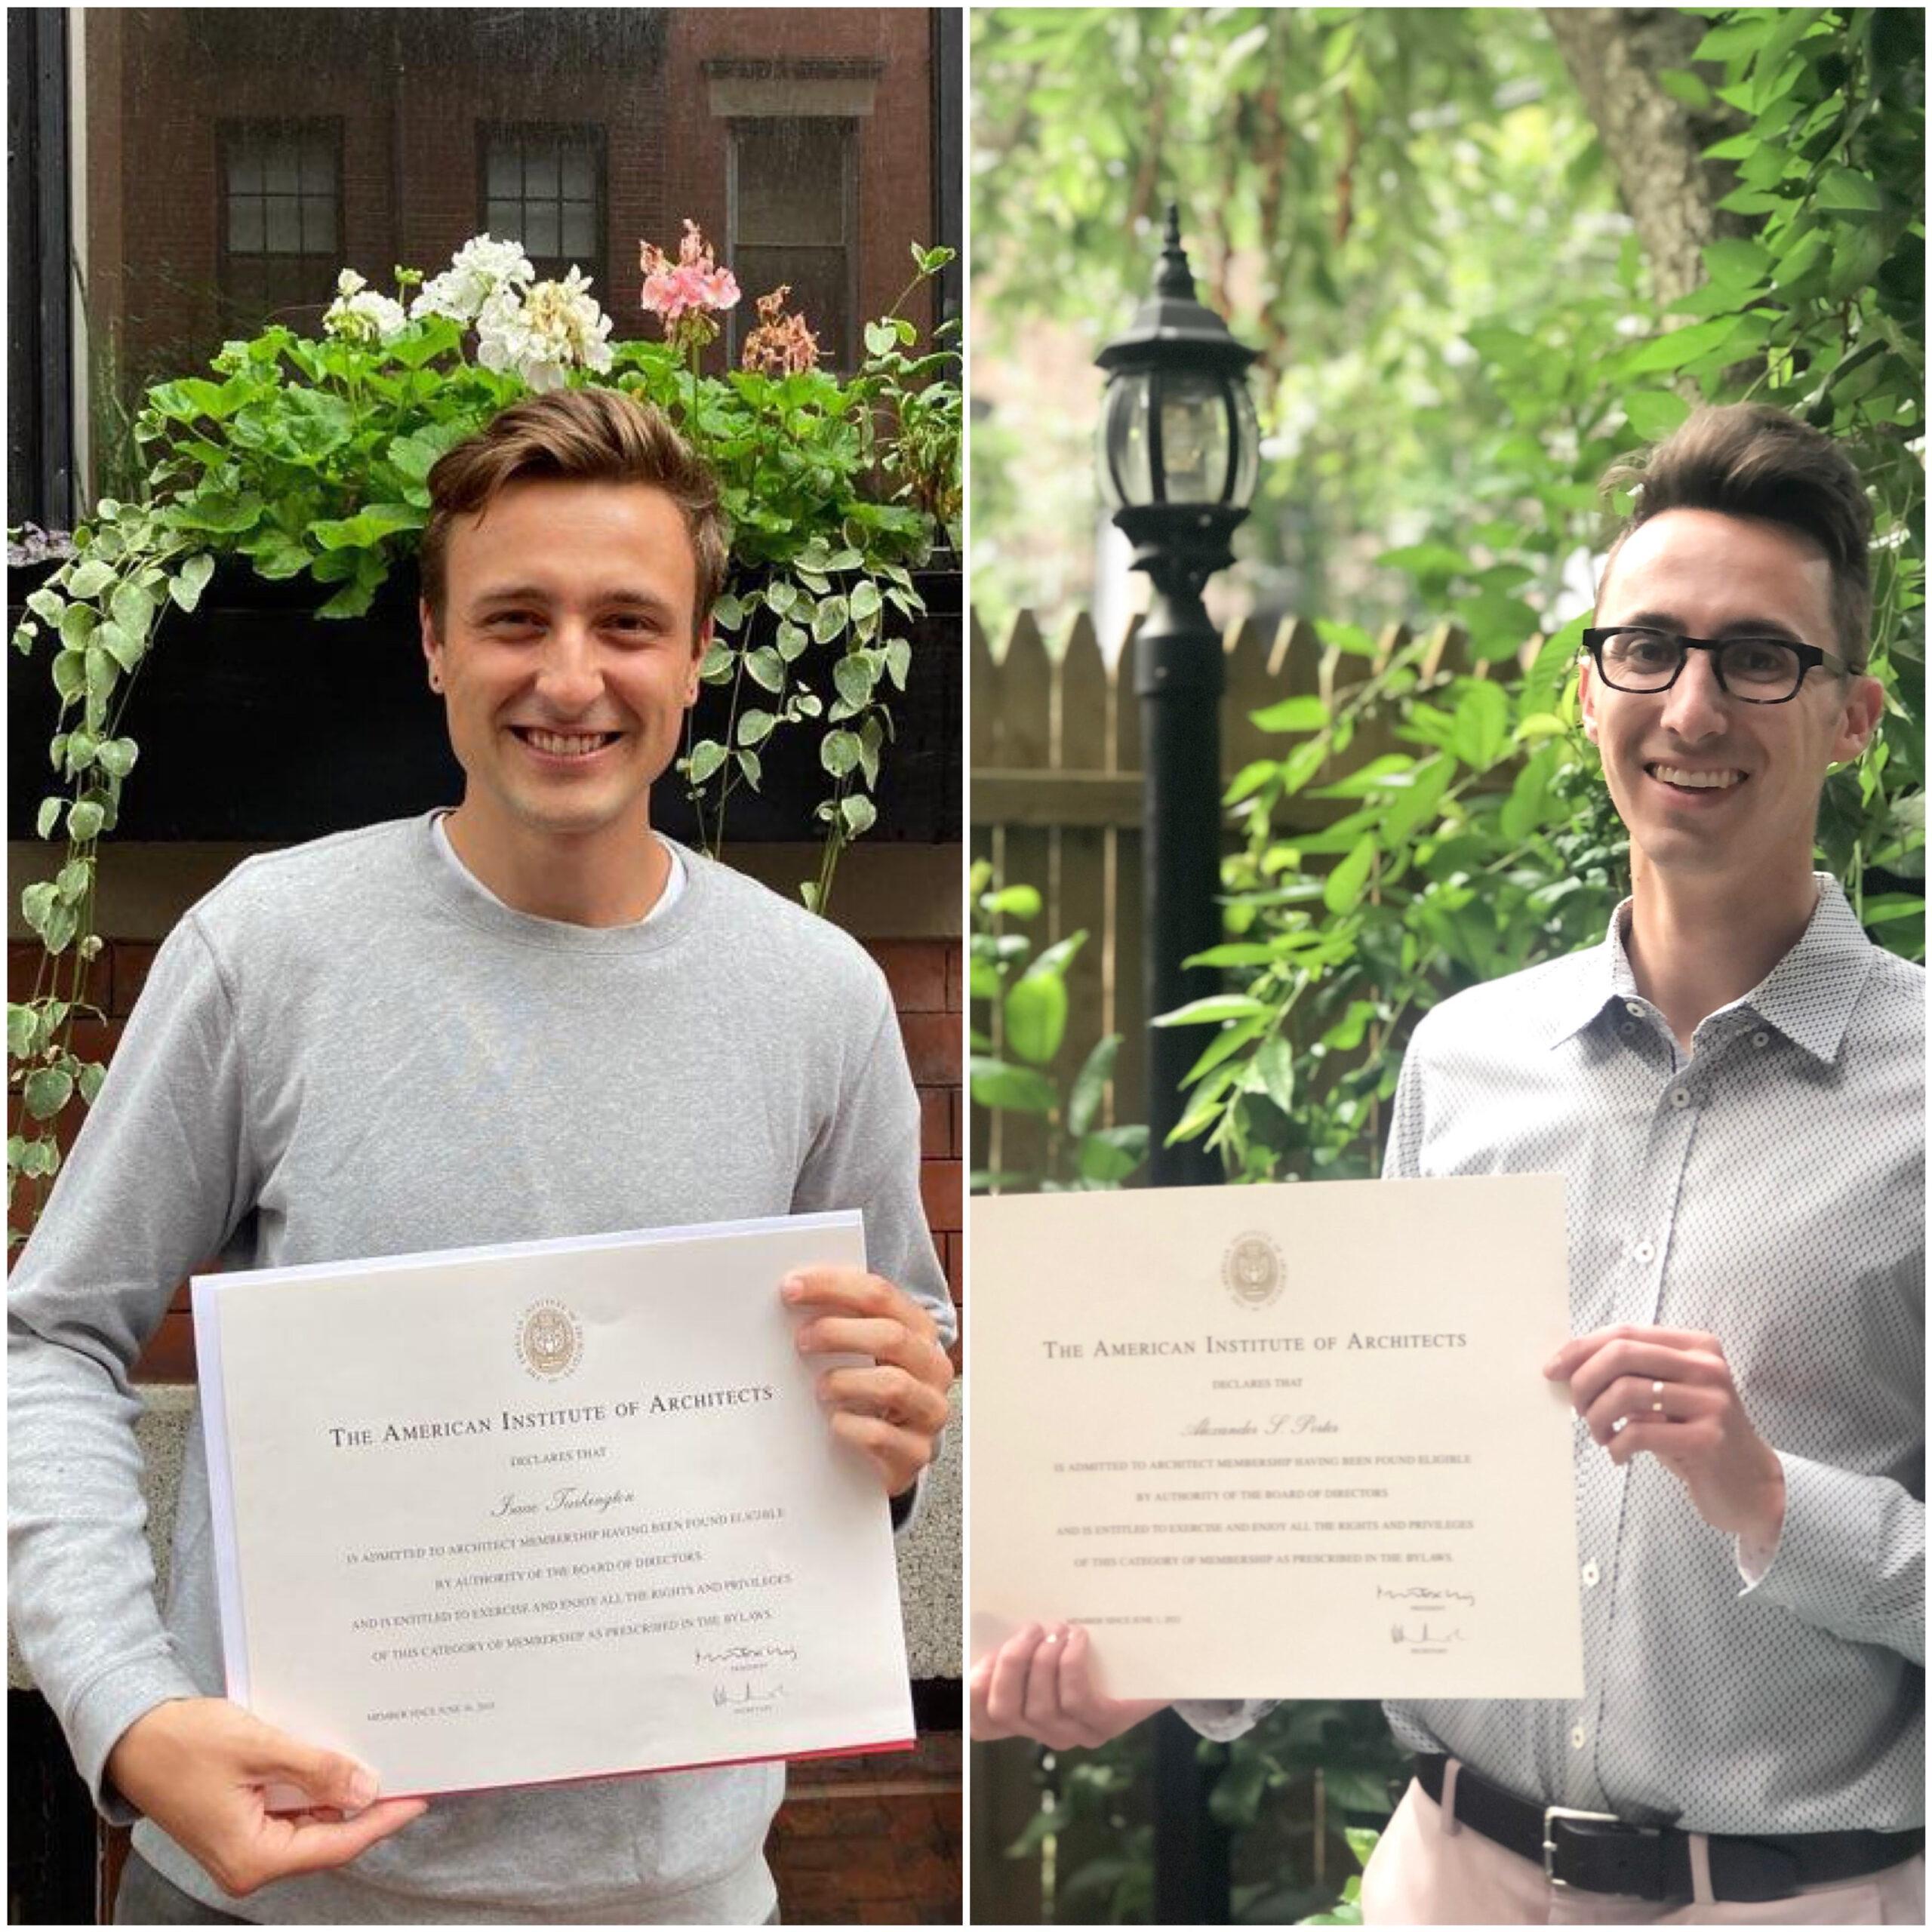 Isaac Turkington and Alexander Porter receive architectural license